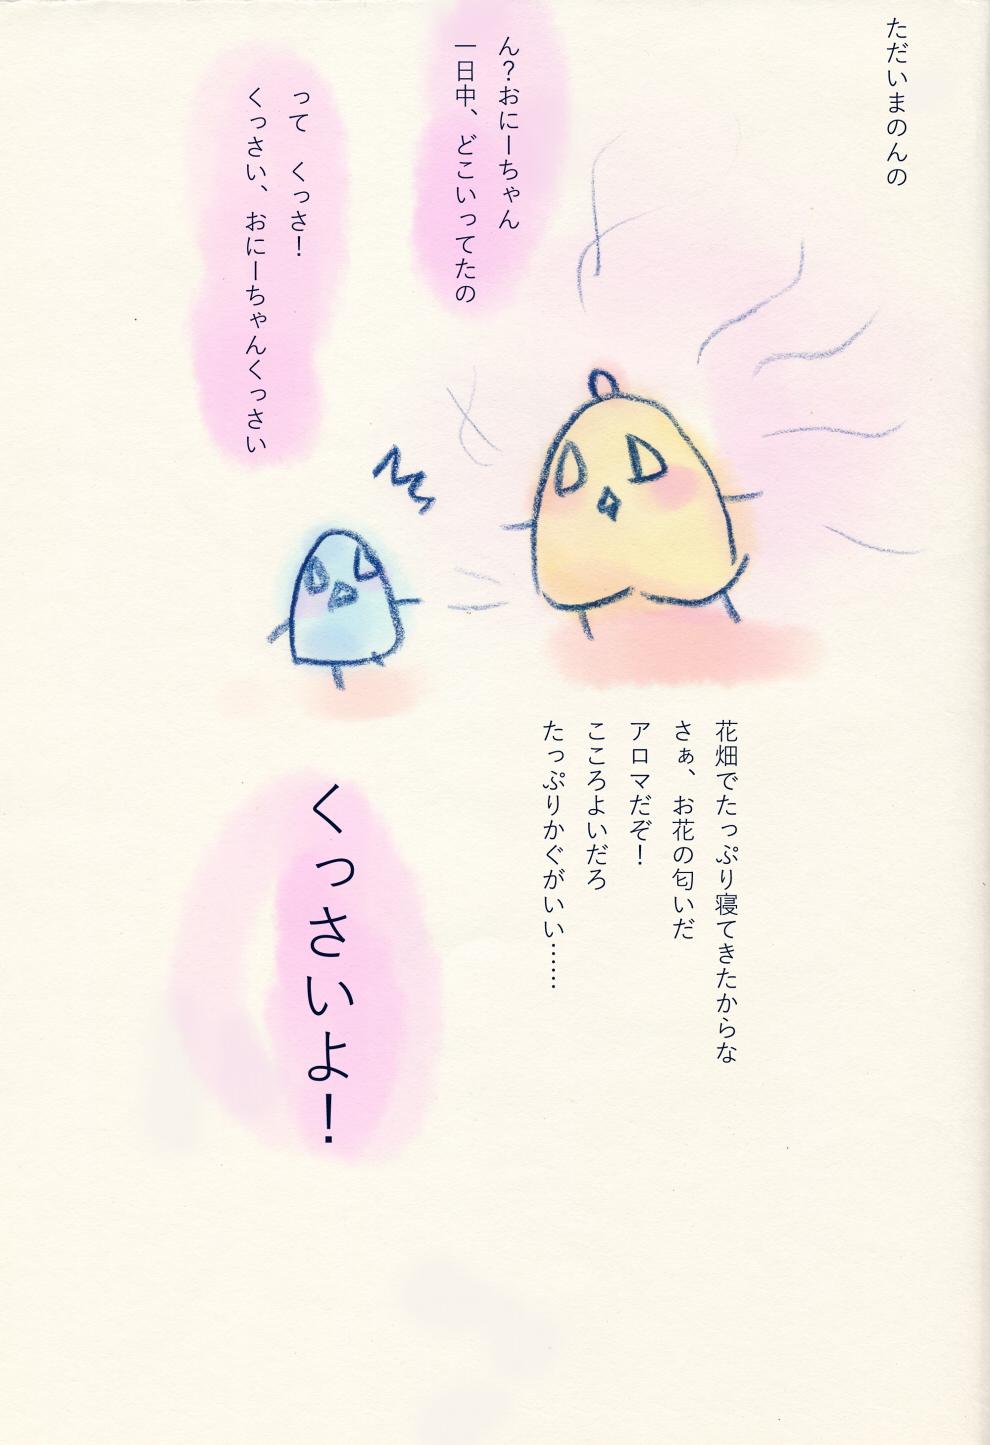 http://ahito.com/comic/short/poji/img//20170807/02.jpg